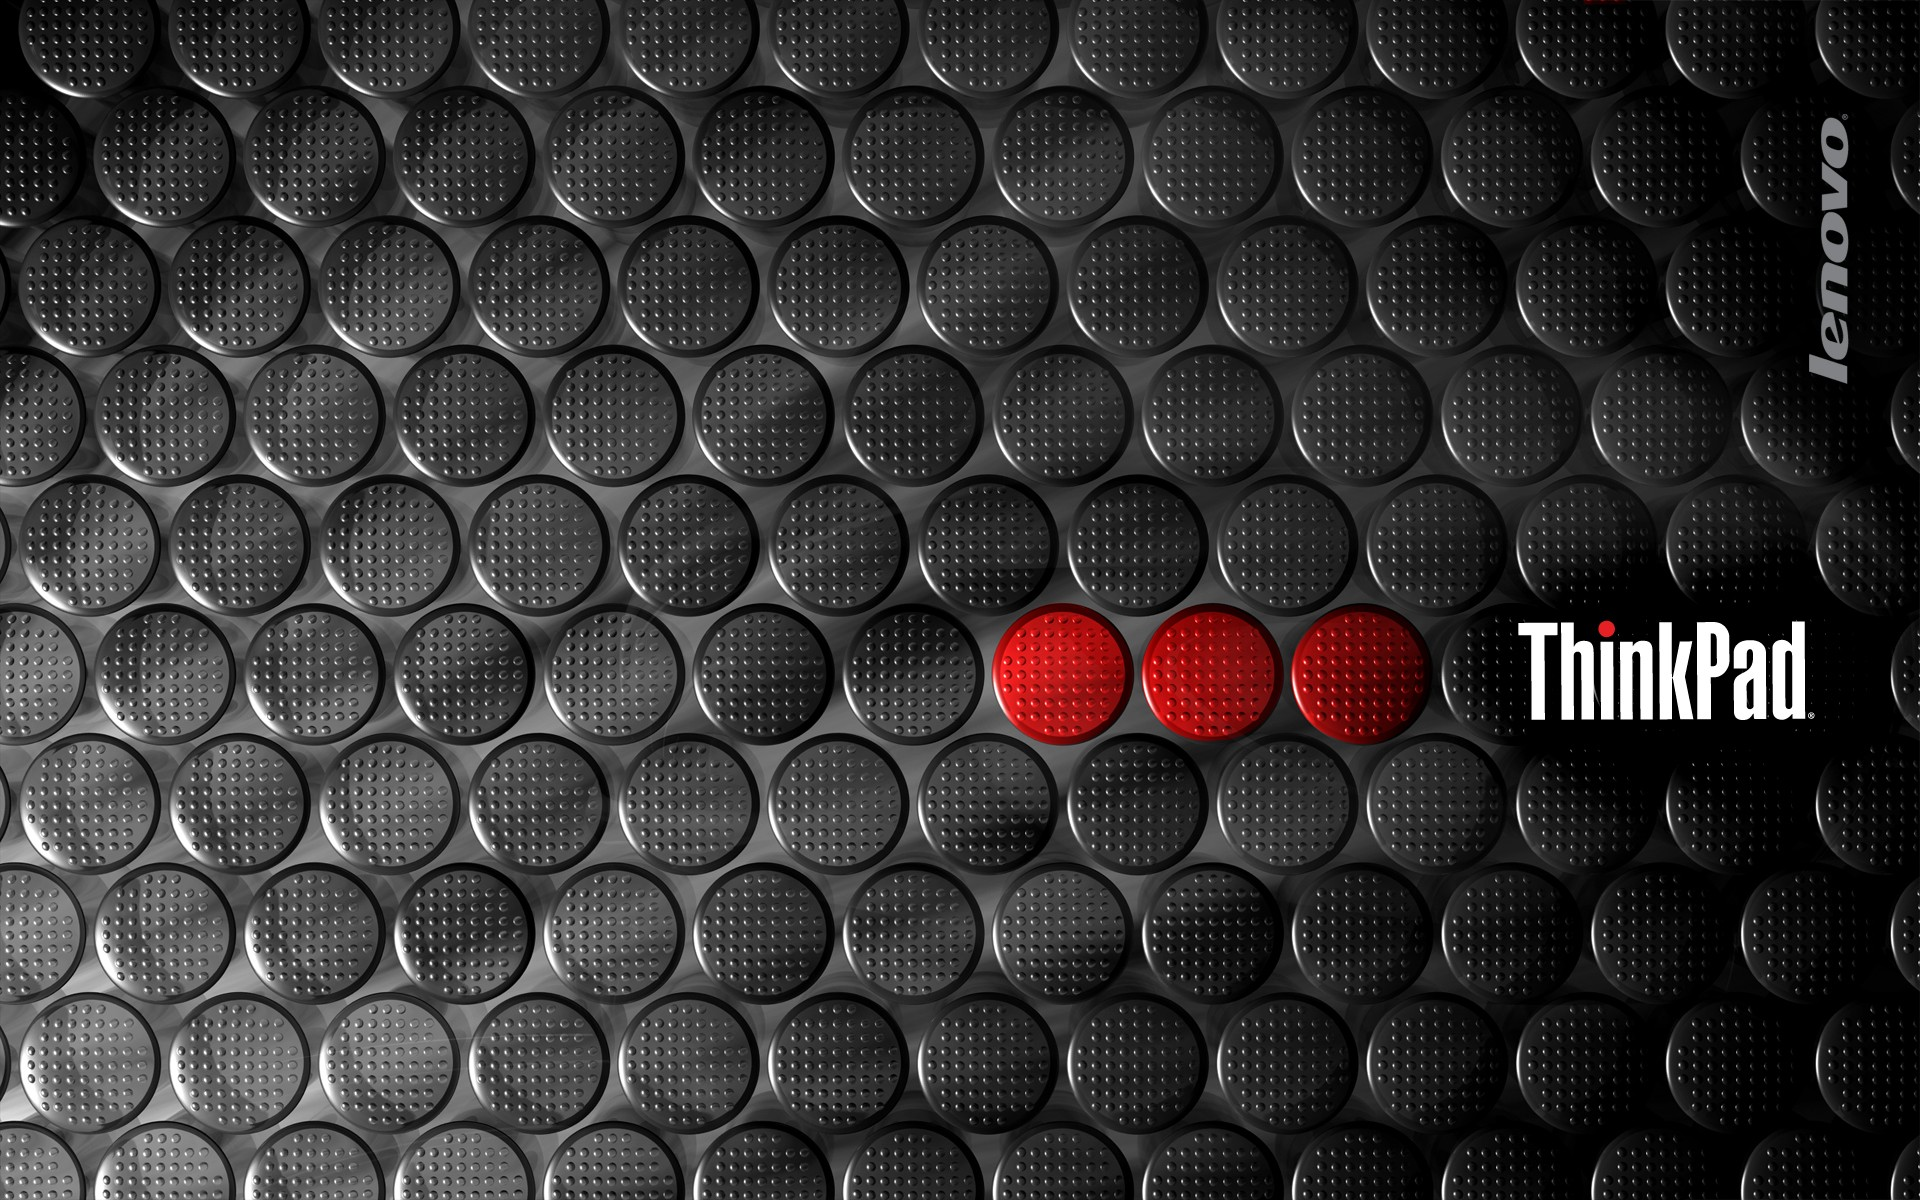 Hd wallpaper lenovo - Lenovo Thinkpad